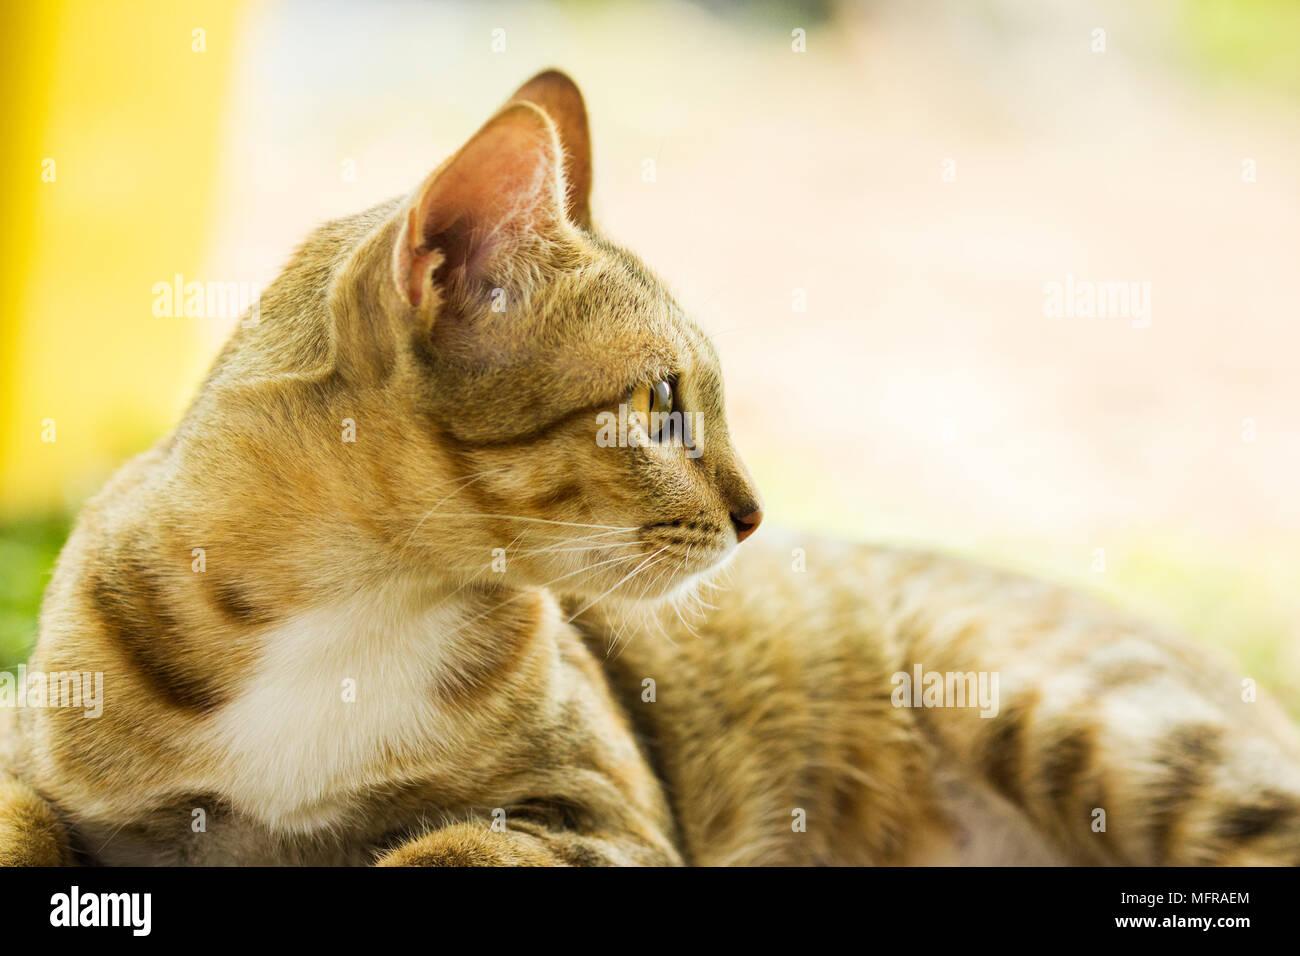 Domestic yellow cat - Stock Image